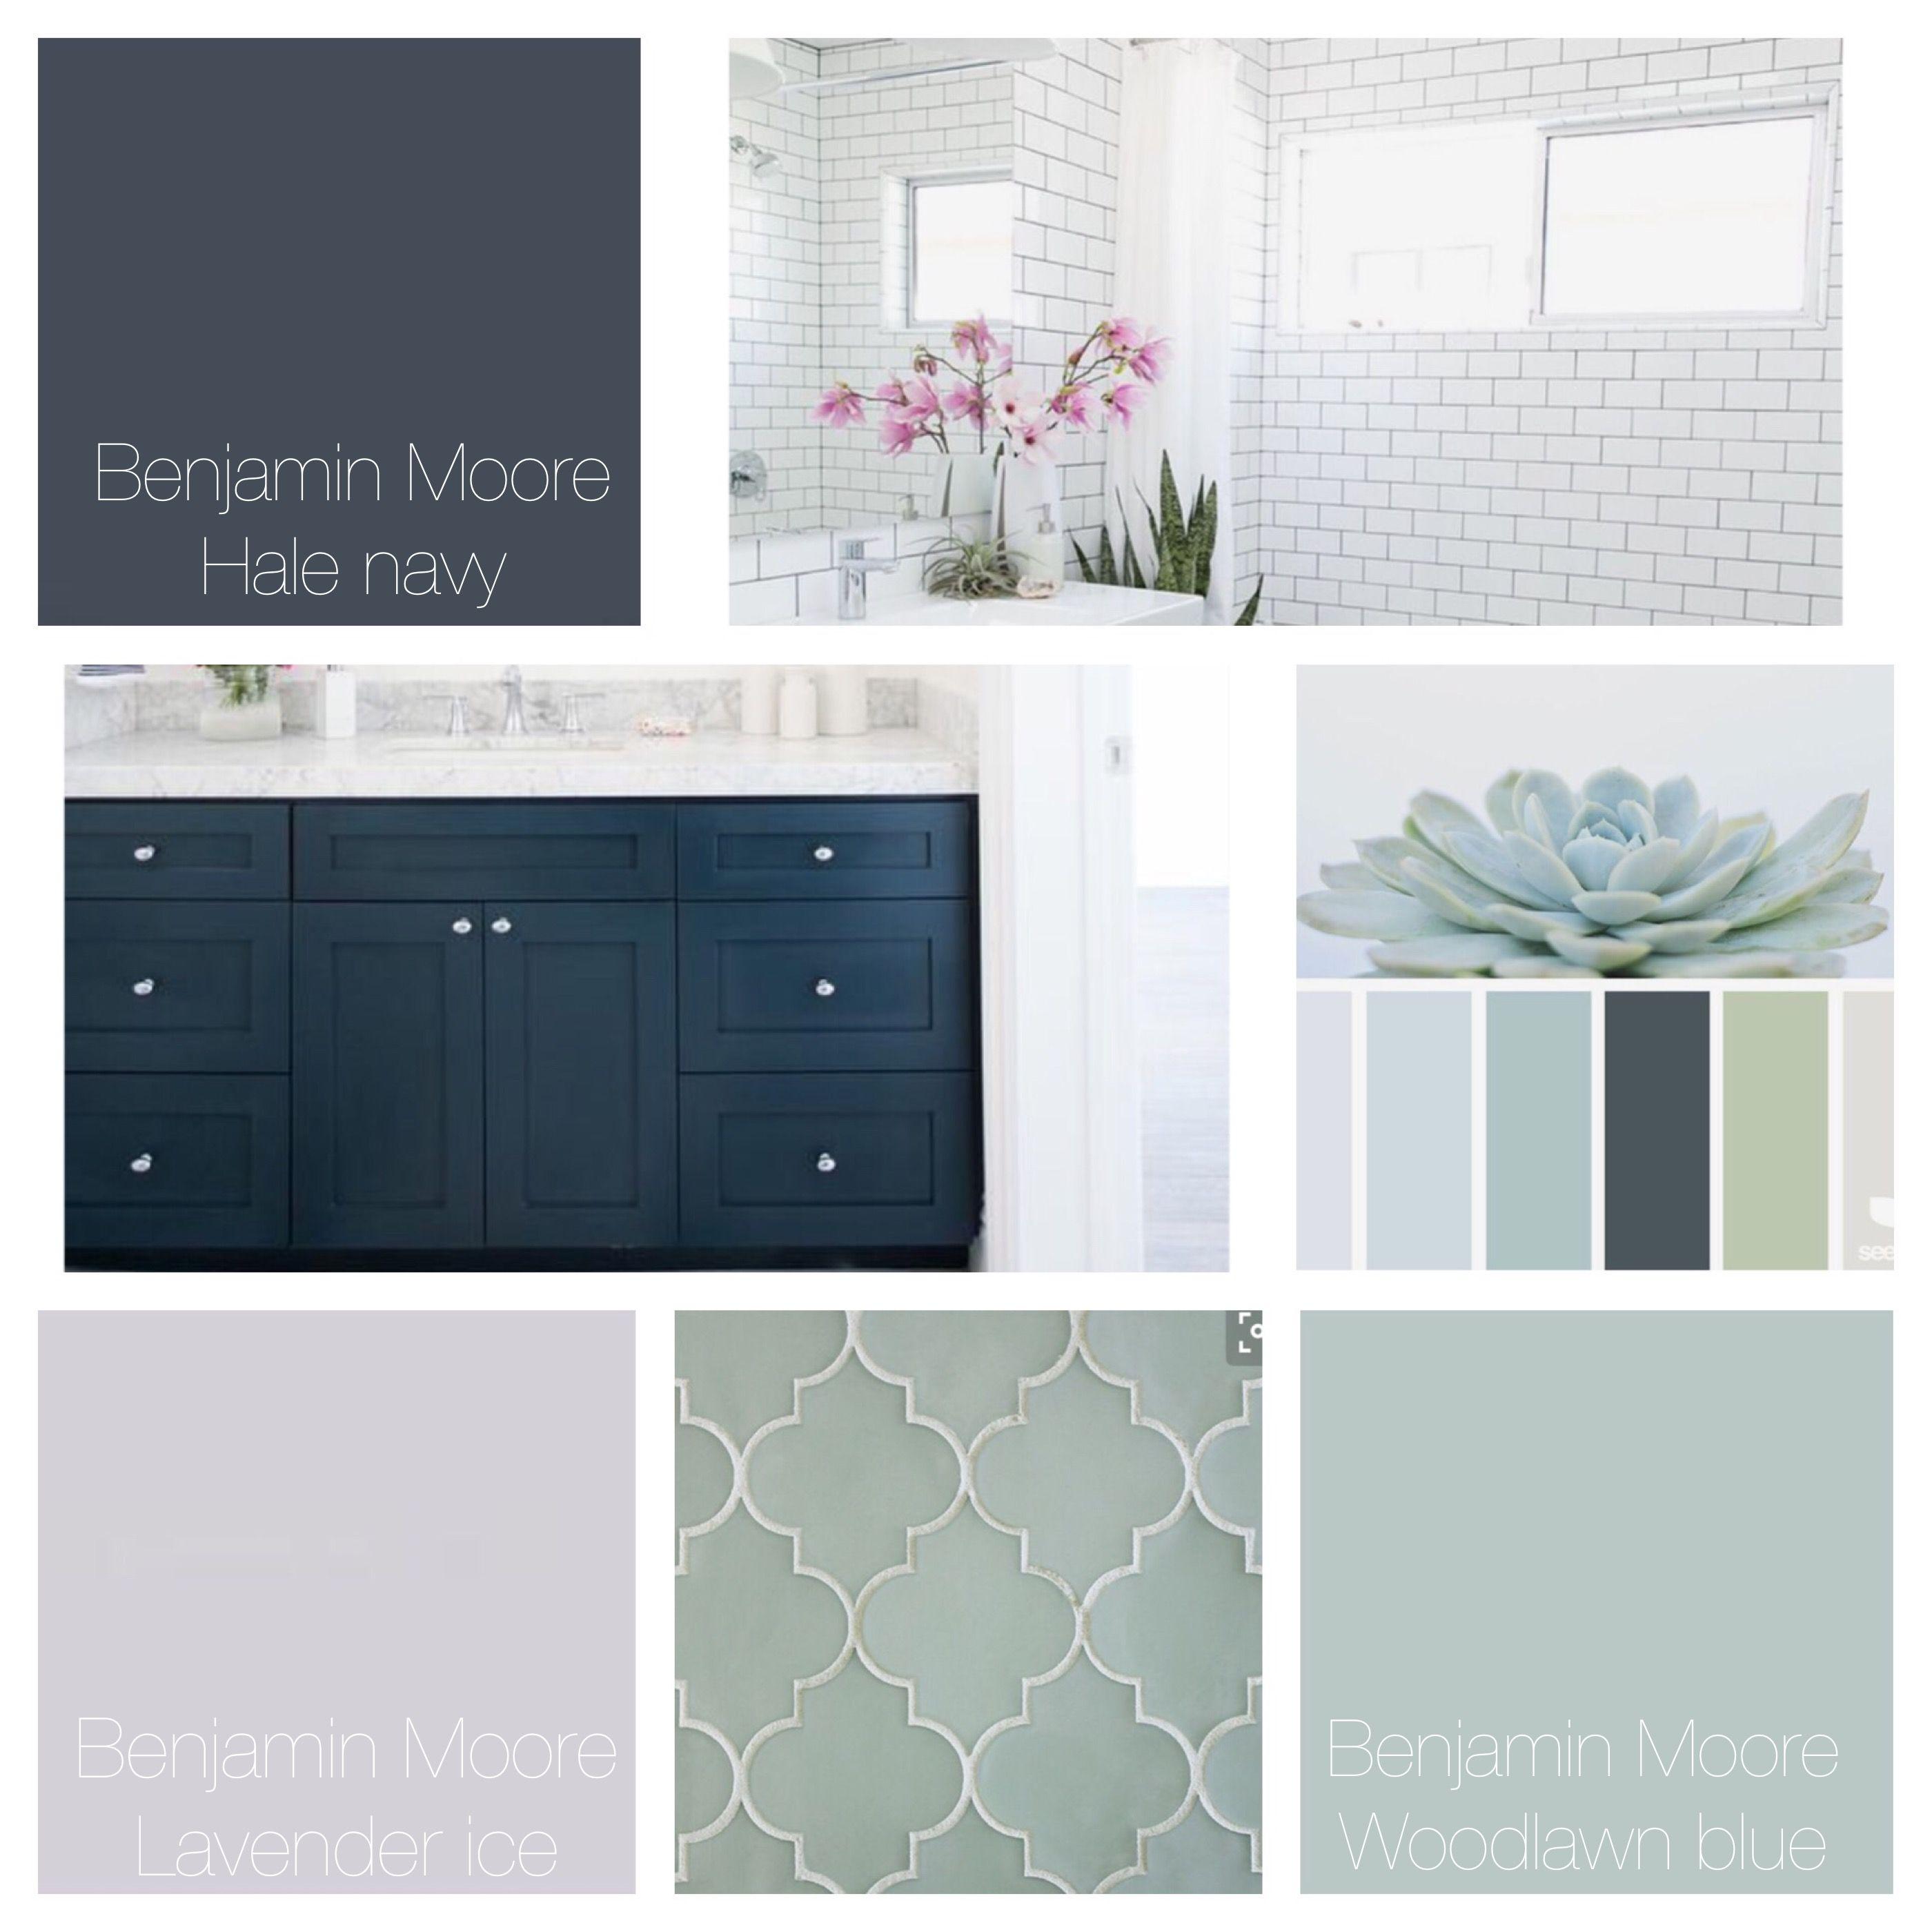 Benjamin moore colors for bathroom - Benjamin Moore Hale Navy Lavender Ice Woodland Blue Bathroom Cabinet Floor And